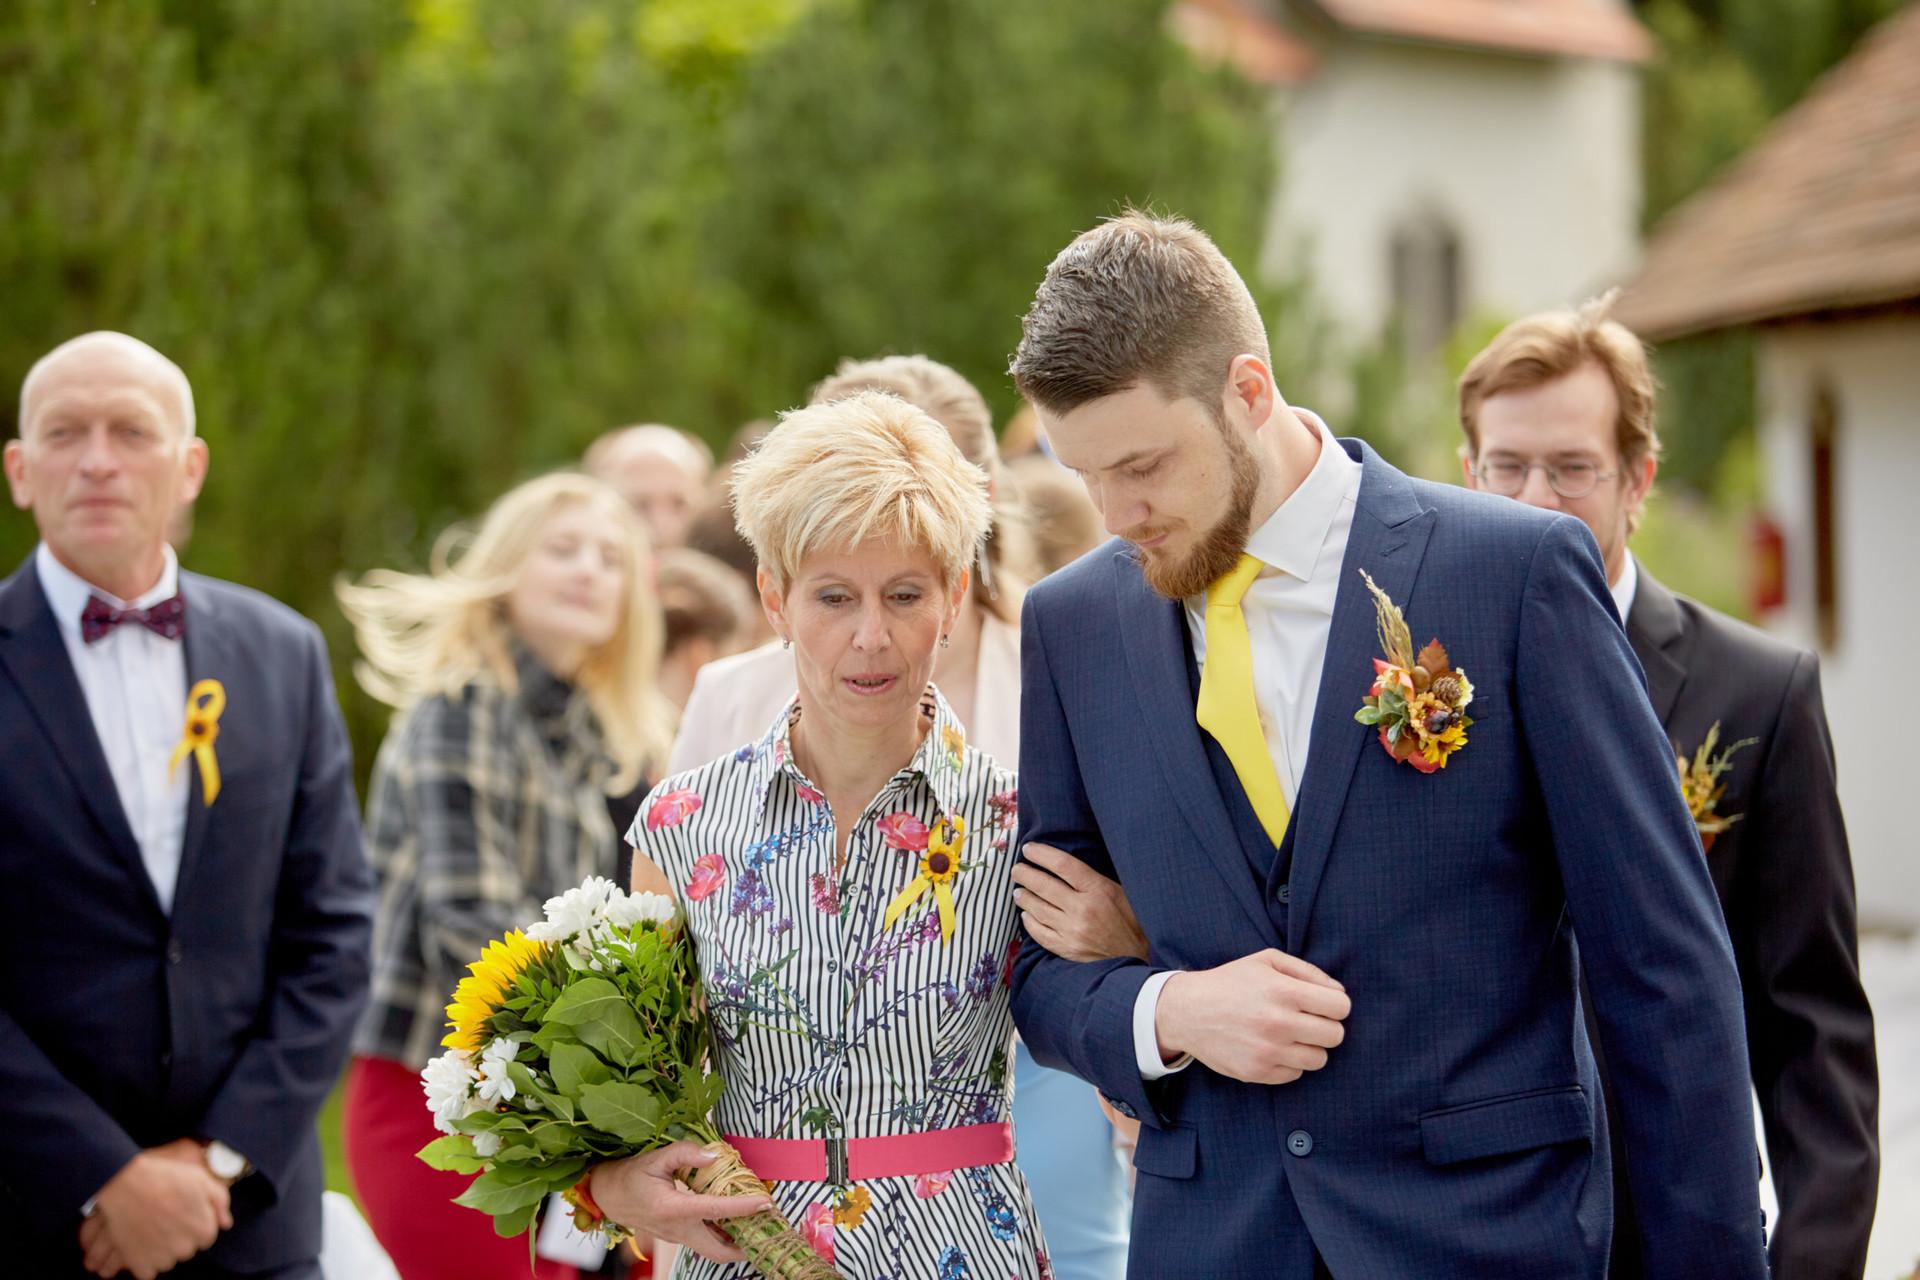 Svatba - Martyna a Adam Suderovi 19.09.2